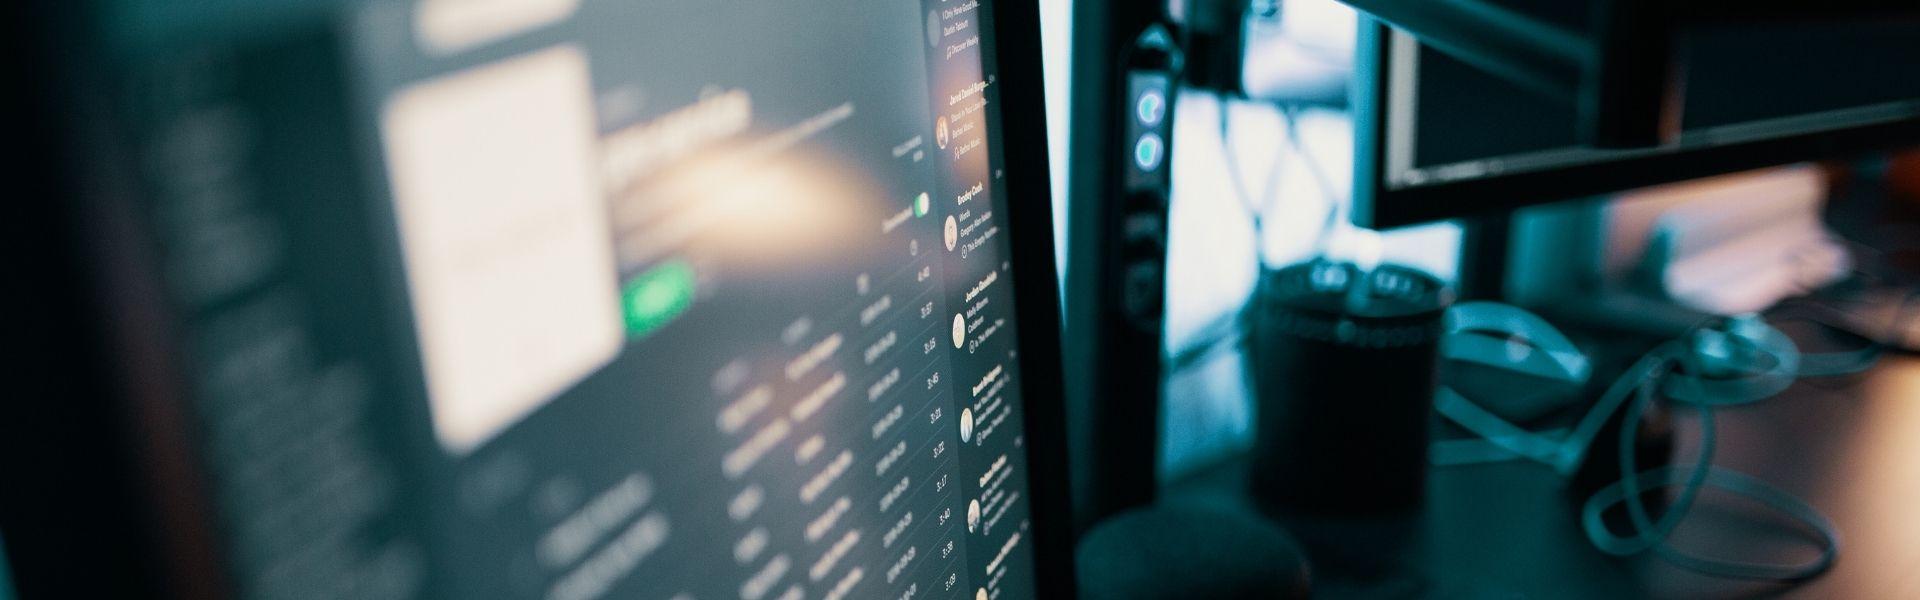 Monitorización de Sistemas Informáticos - Semantic Systems